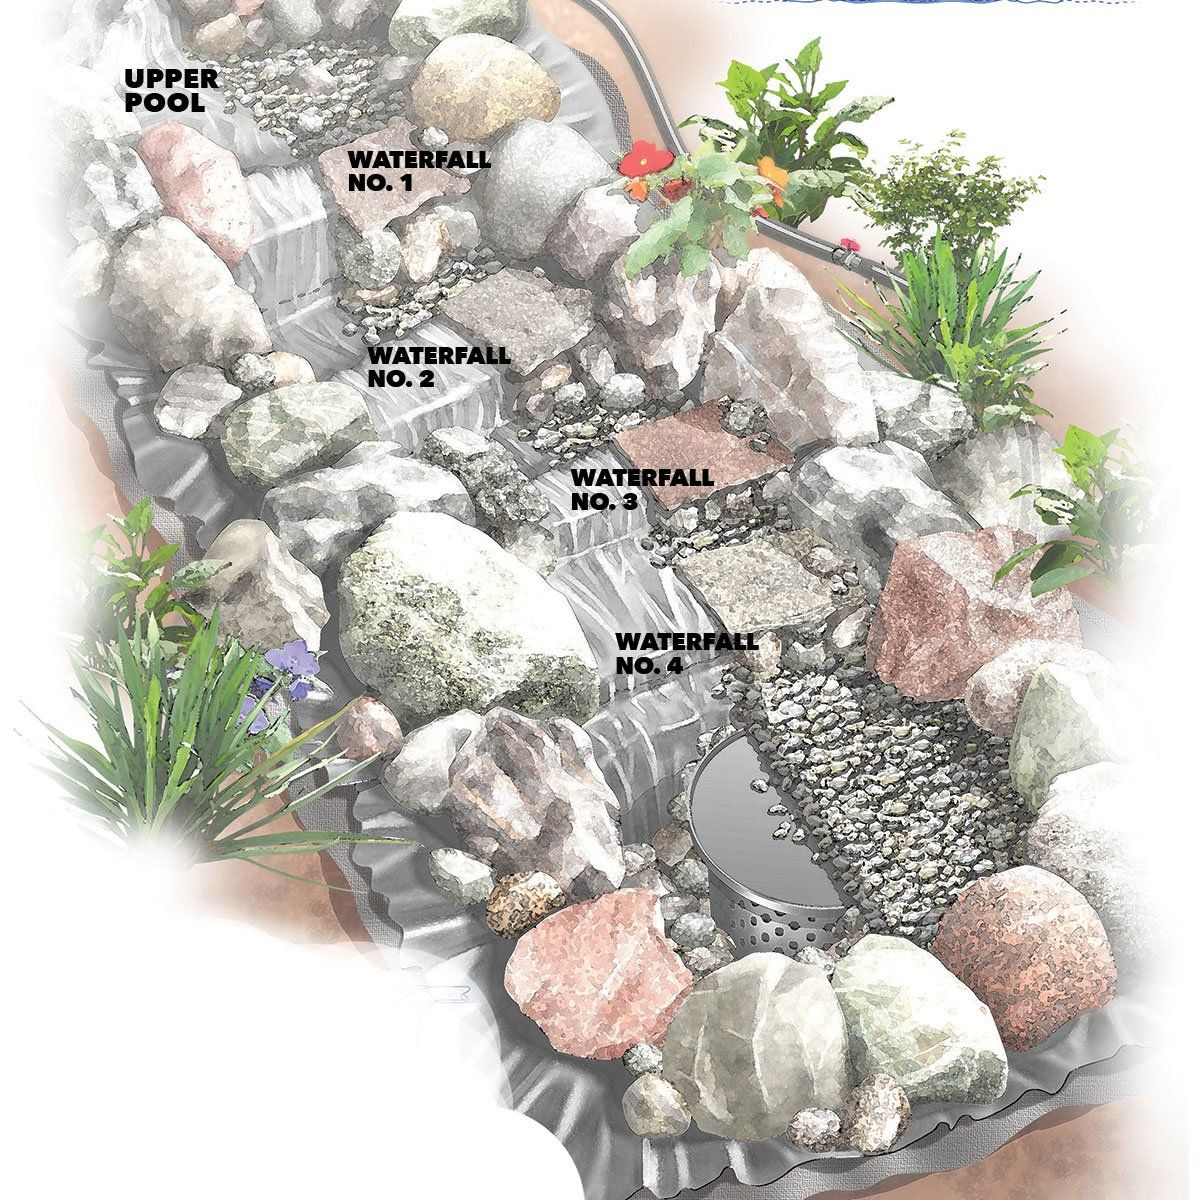 Build a backyard waterfall and stream in 2020 waterfalls